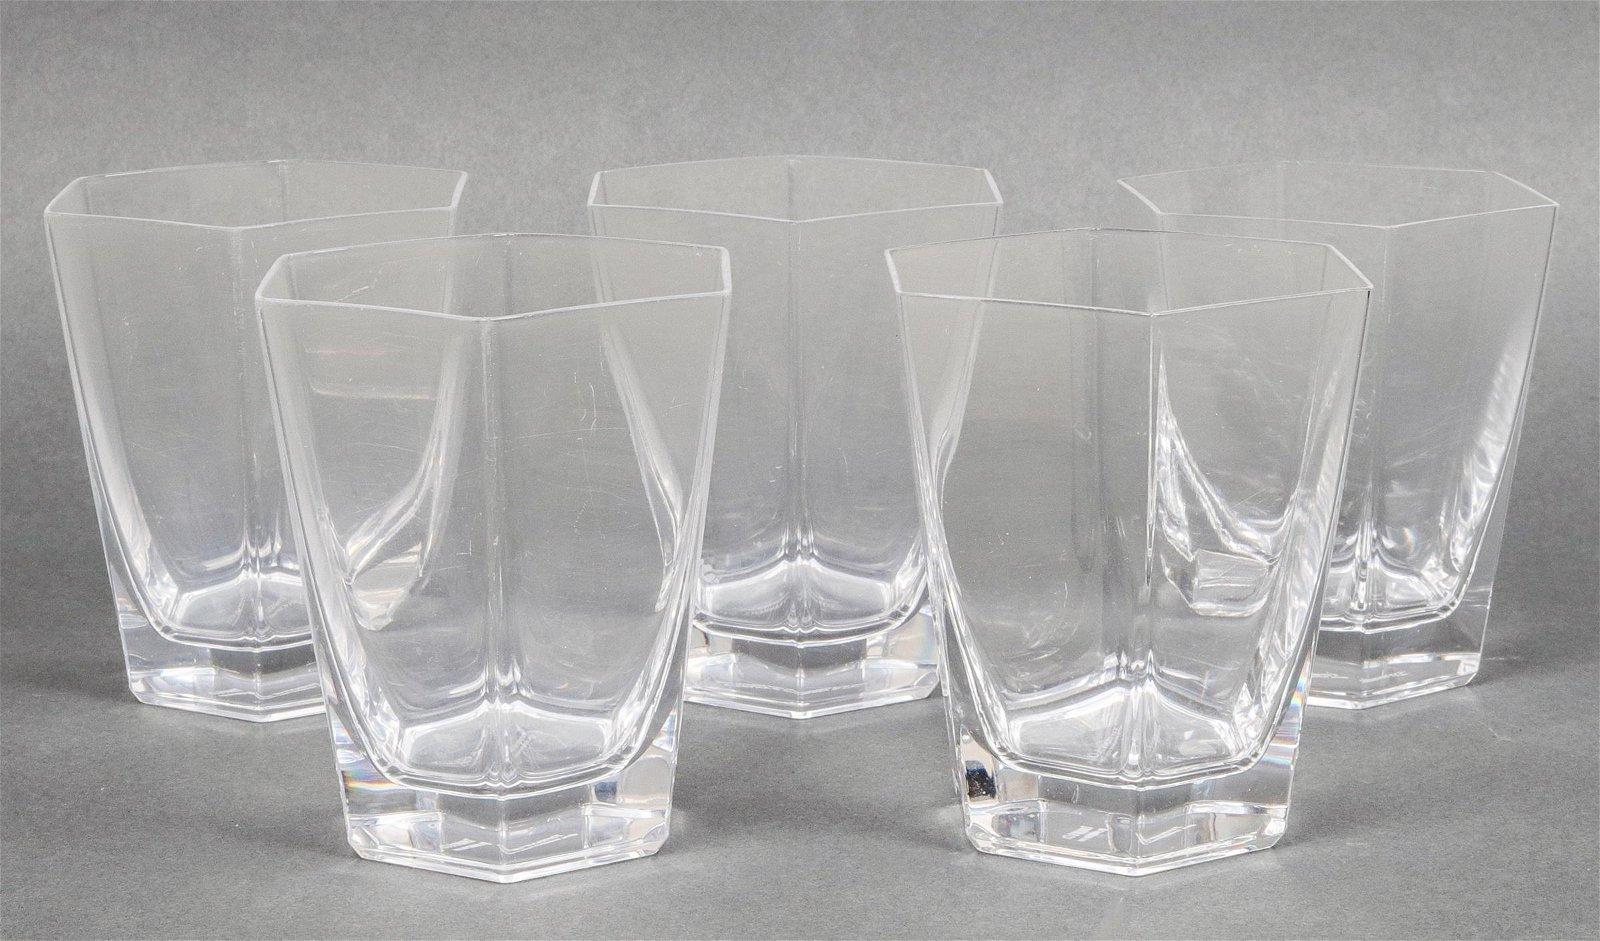 Tiffany & Co. Frank Lloyd Wright Rocks Glasses, 5